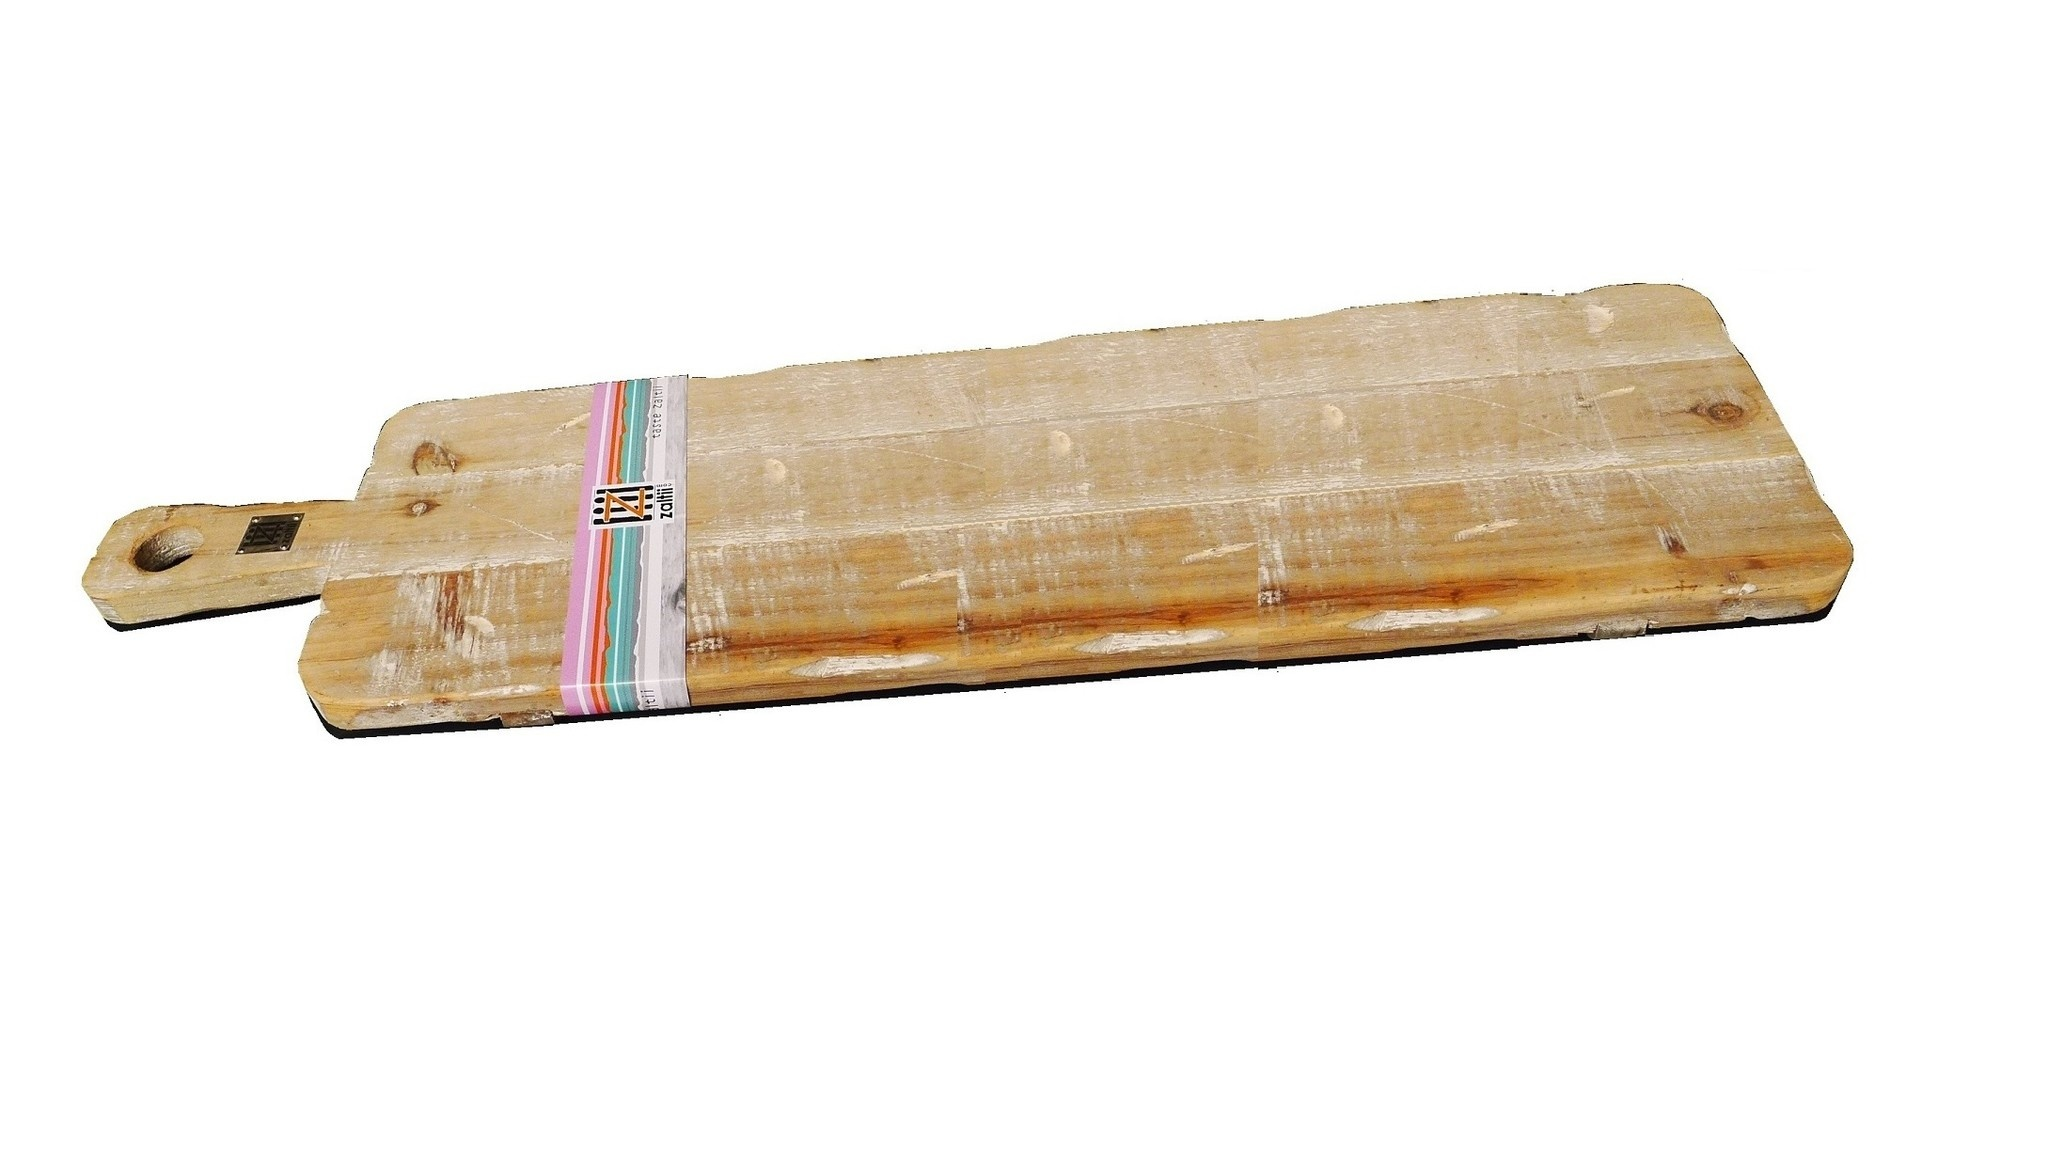 trayold dutchcutting blade 66/20-2